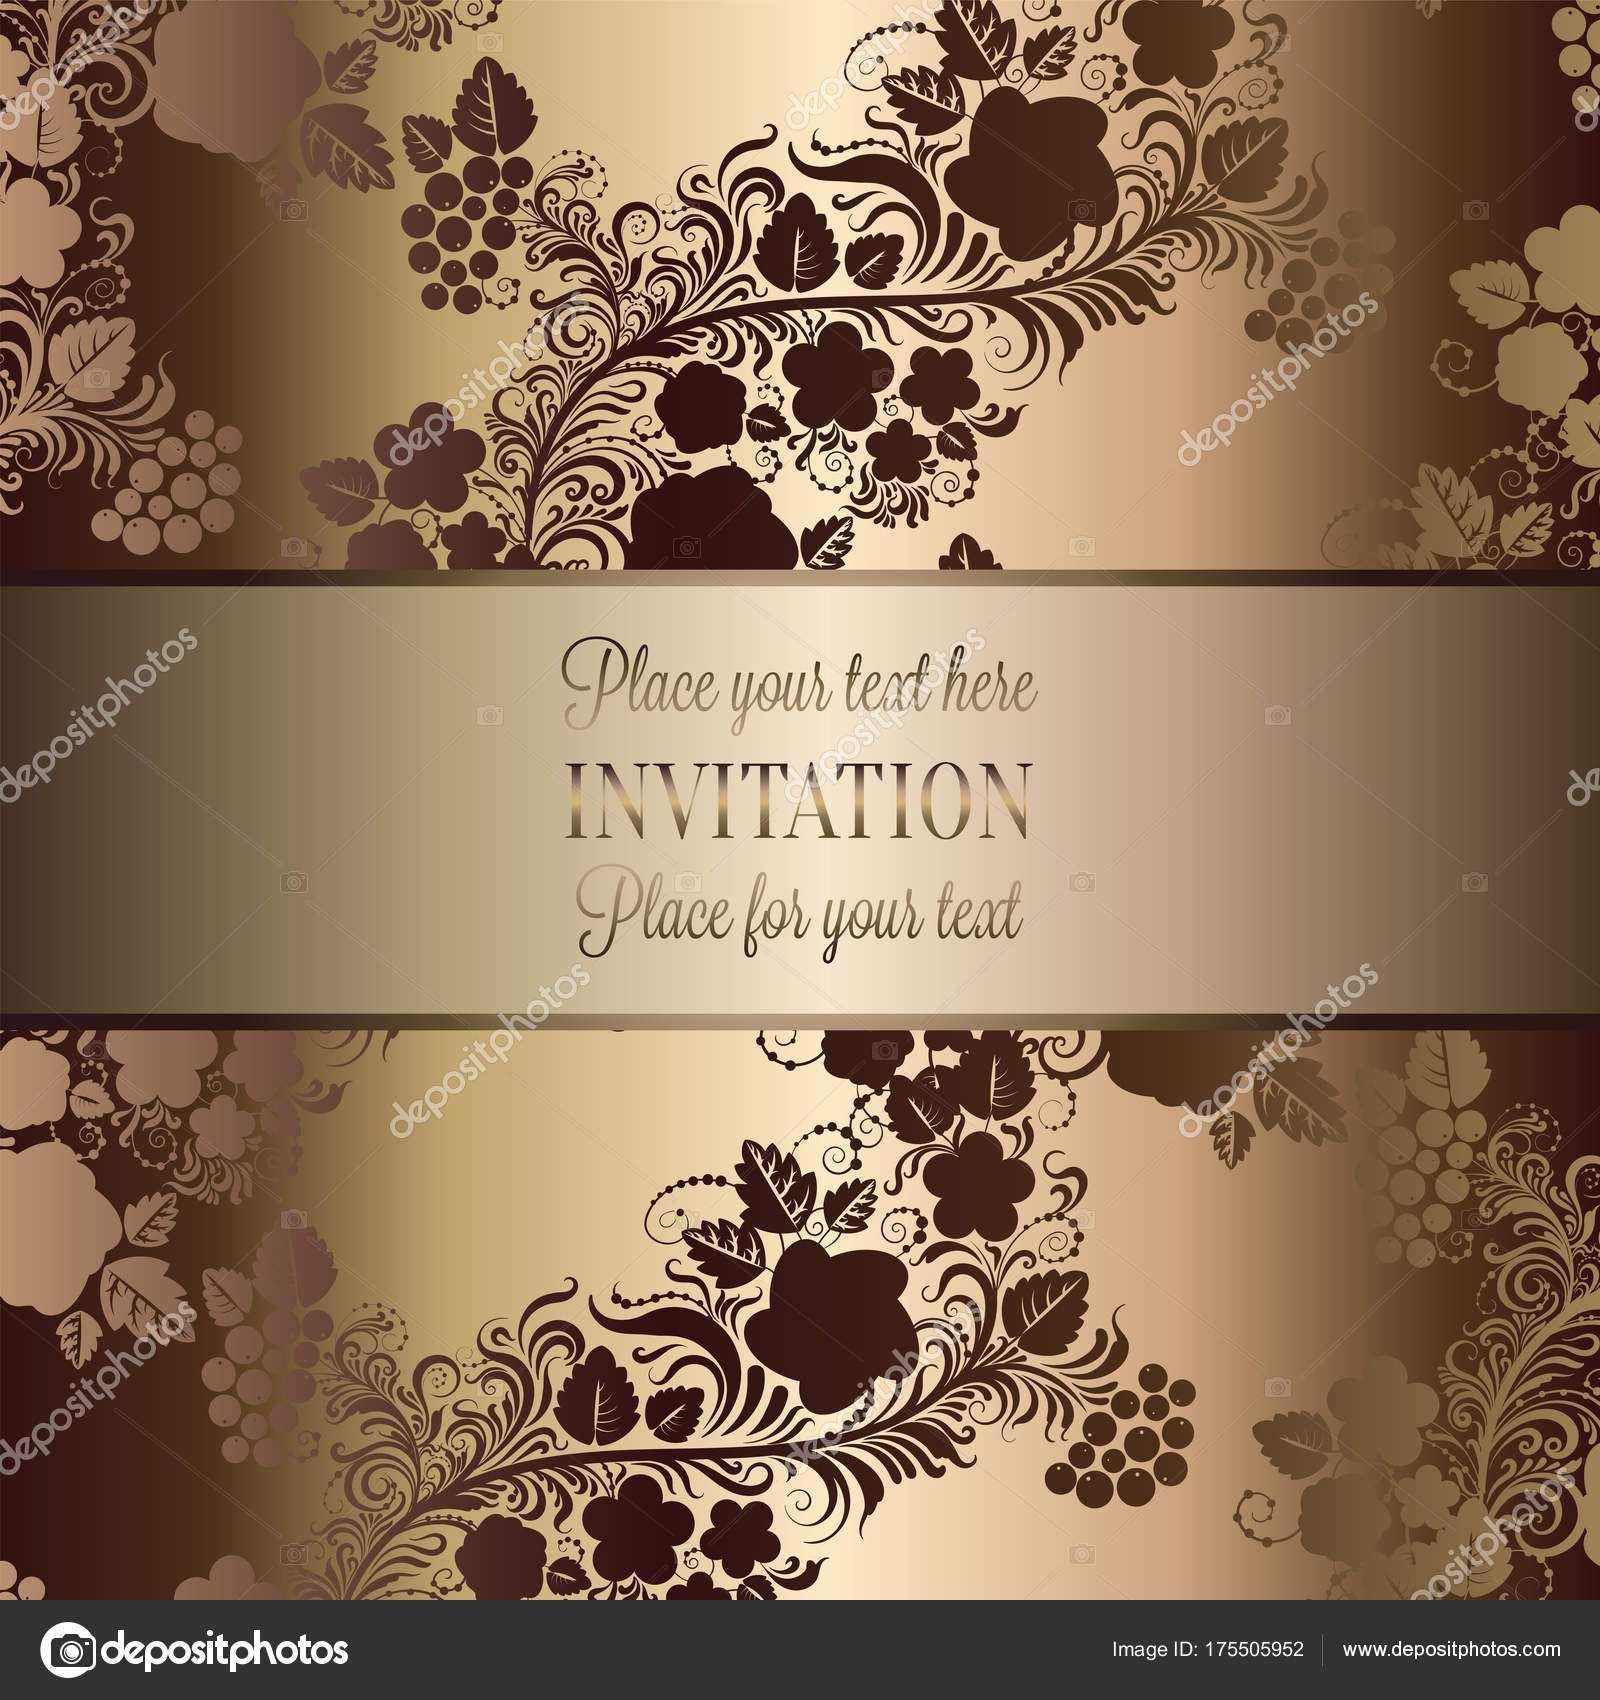 59 Customize Wedding Invitation Template Background Download with Wedding Invitation Template Background